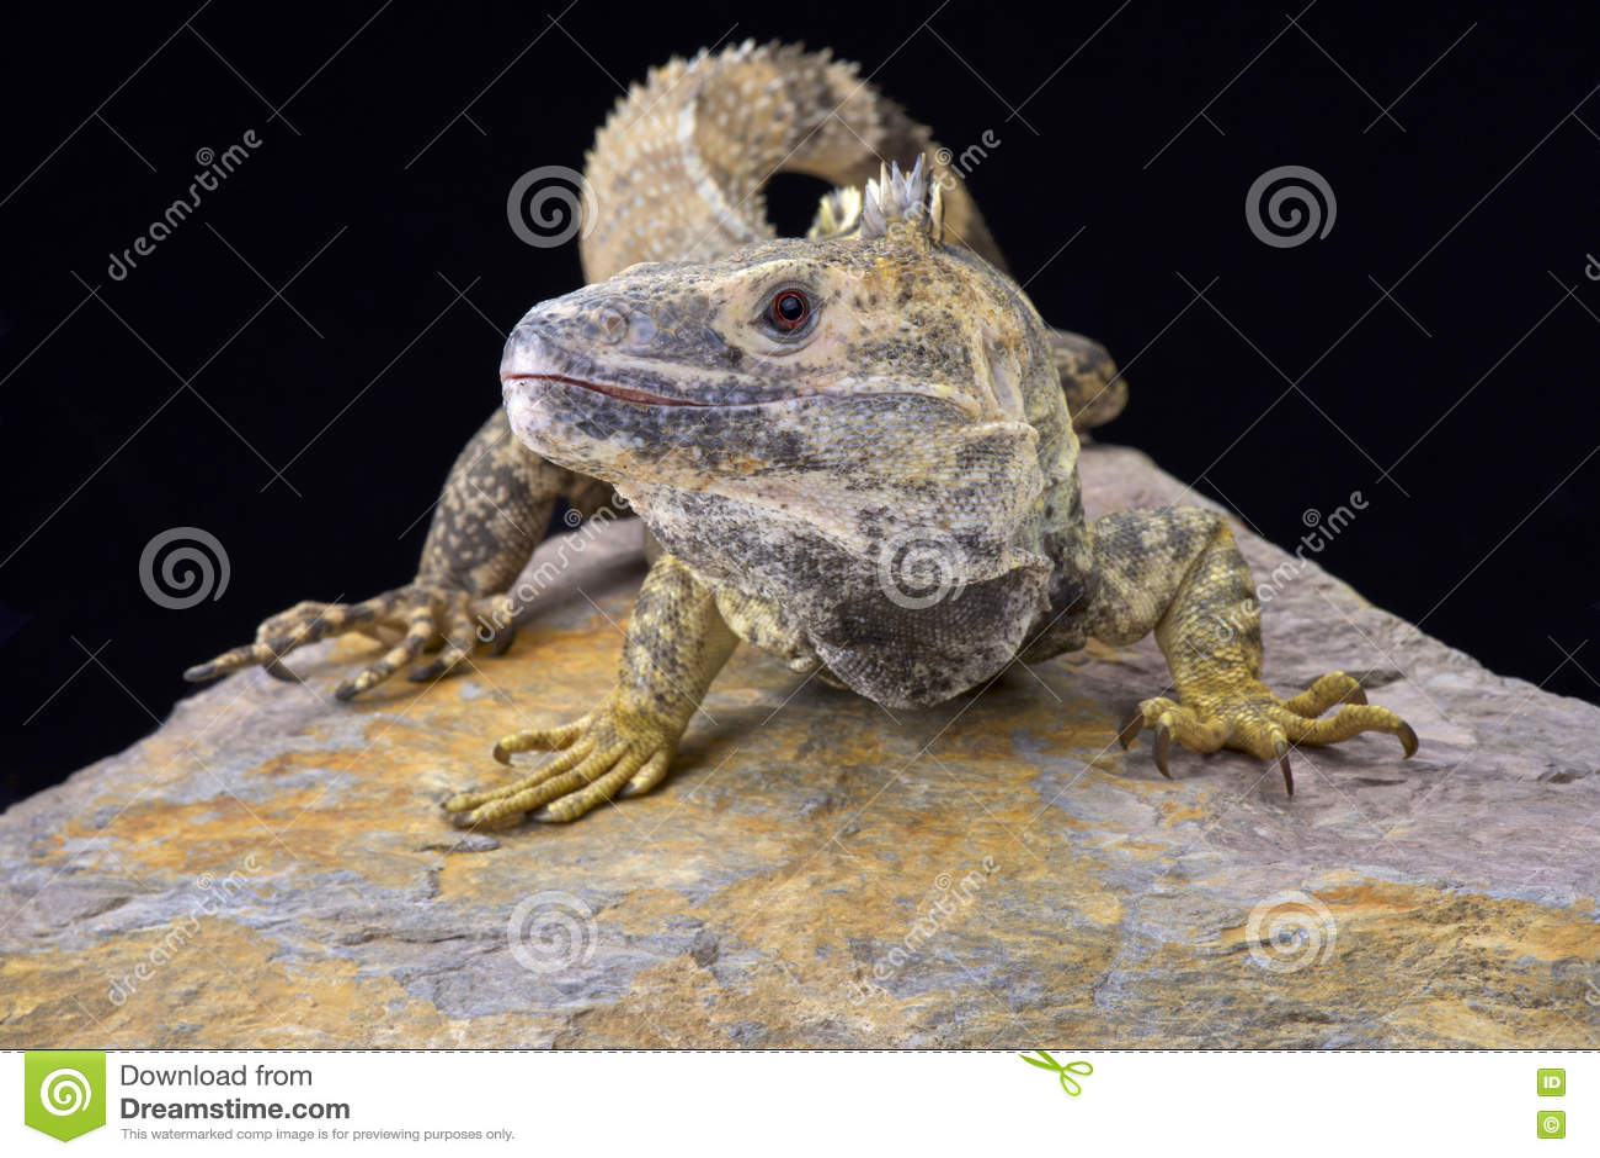 Iguana coperto di spine-munita messicano (Ctenosaura pettinato)